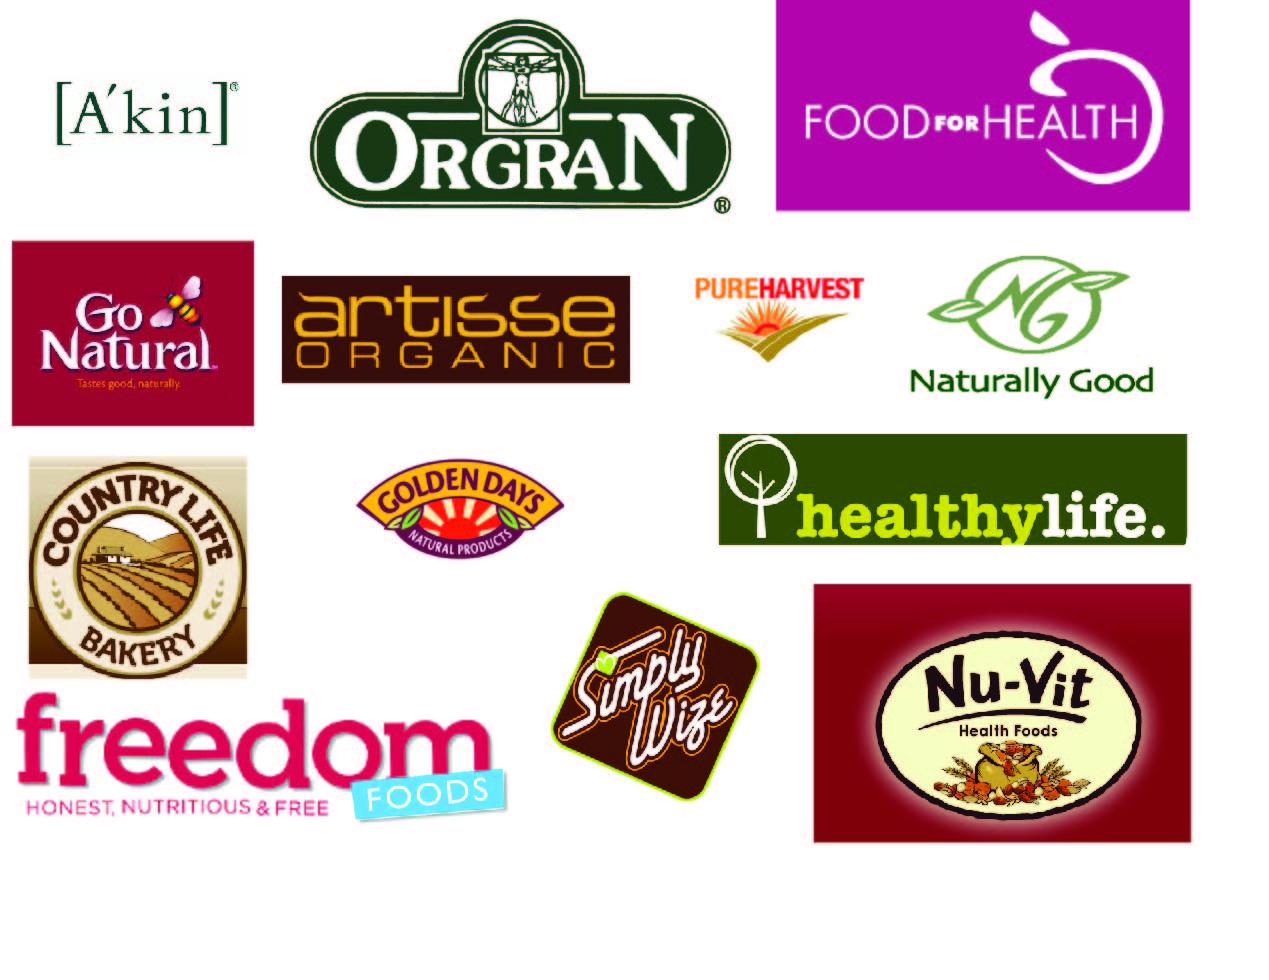 Food Brand Logos Images Galleries